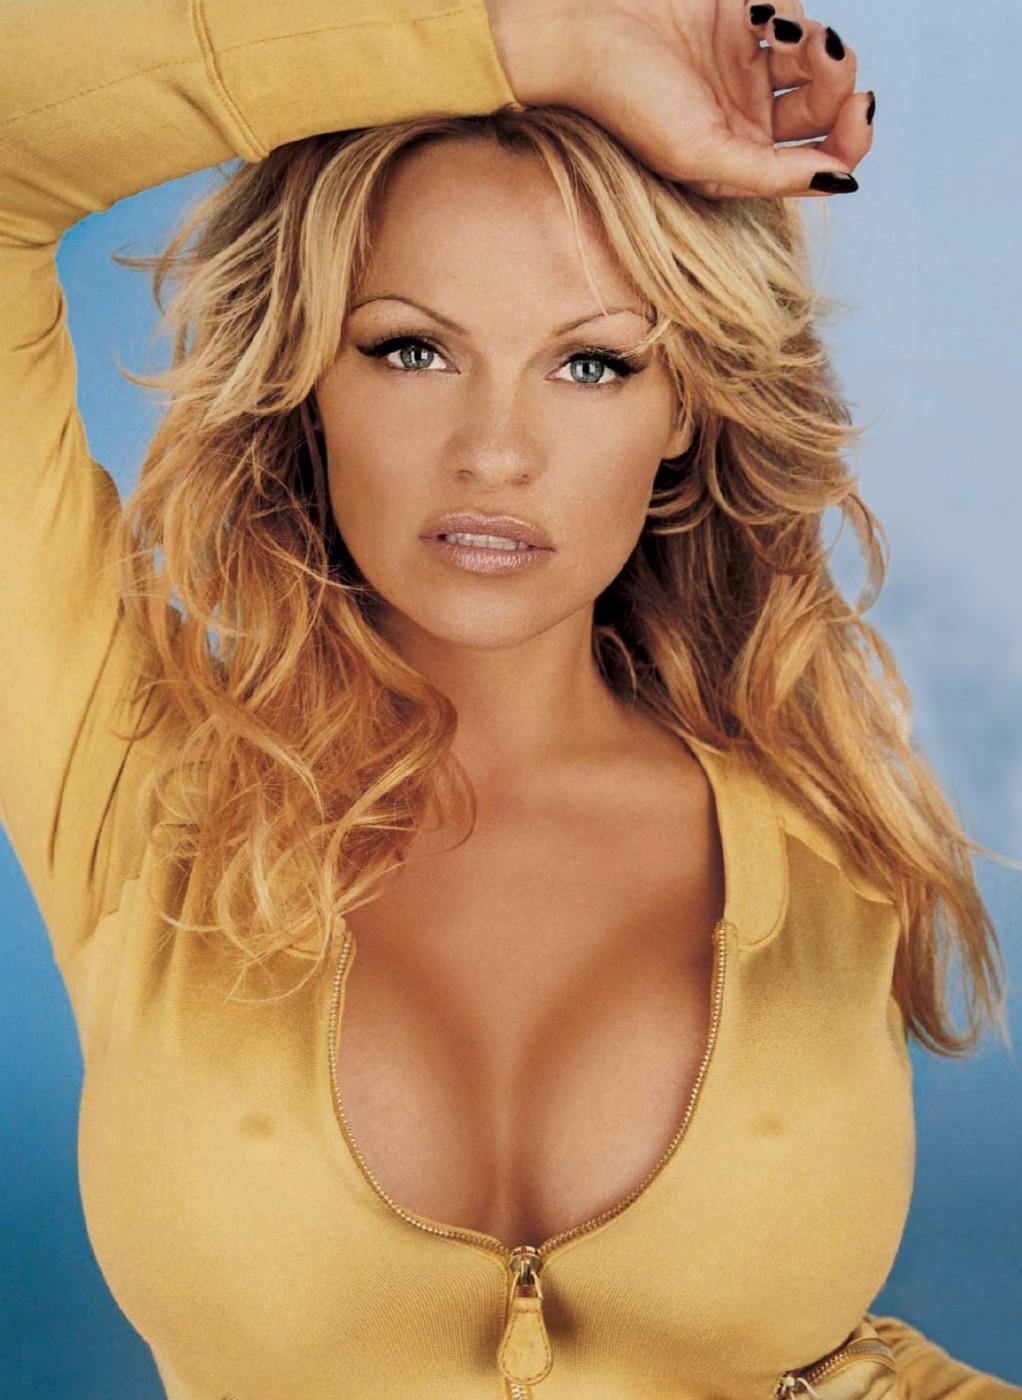 Pamela-Anderson-reklamiruet-chulki-1-22